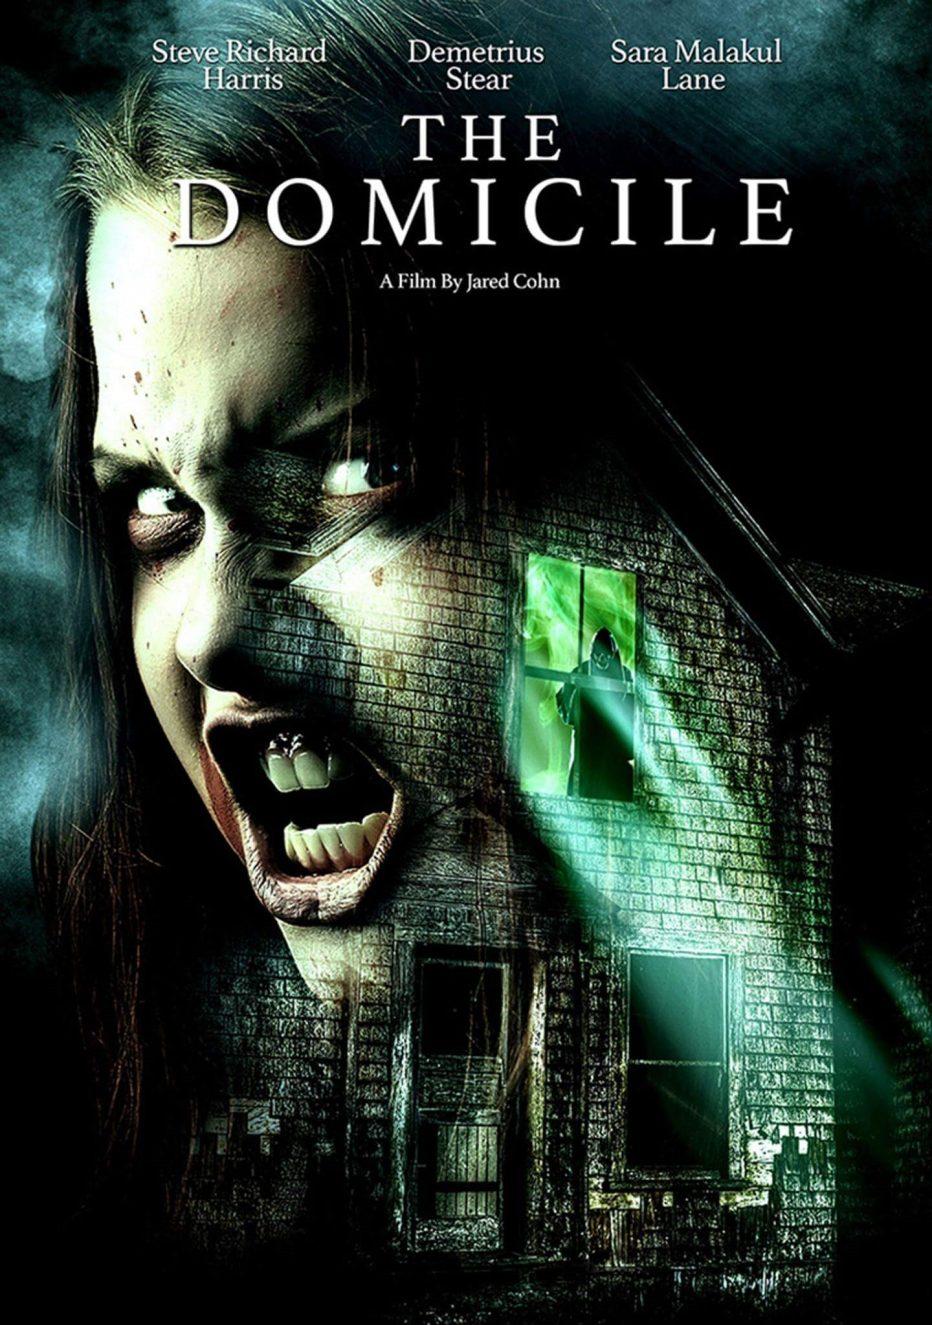 Terror lurks inside THE DOMICILE!